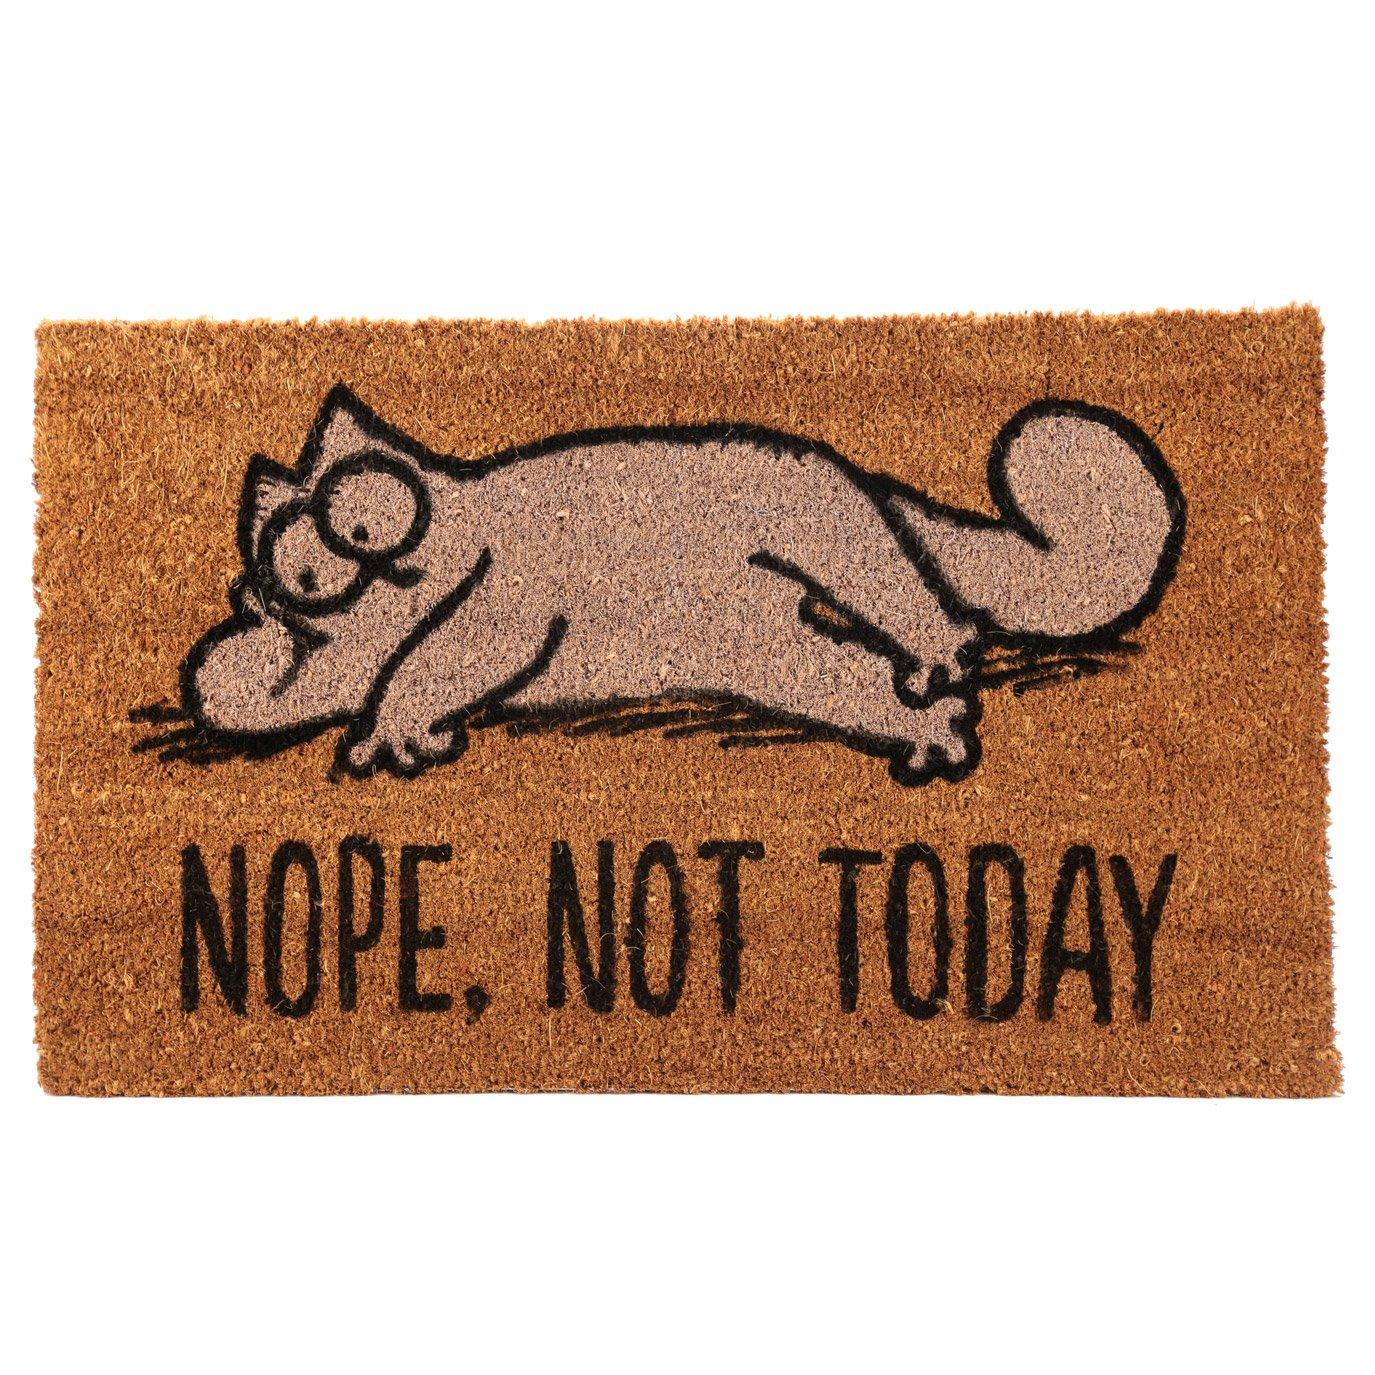 Simon's Cat Fußmatte NOPE, NOT TODAY